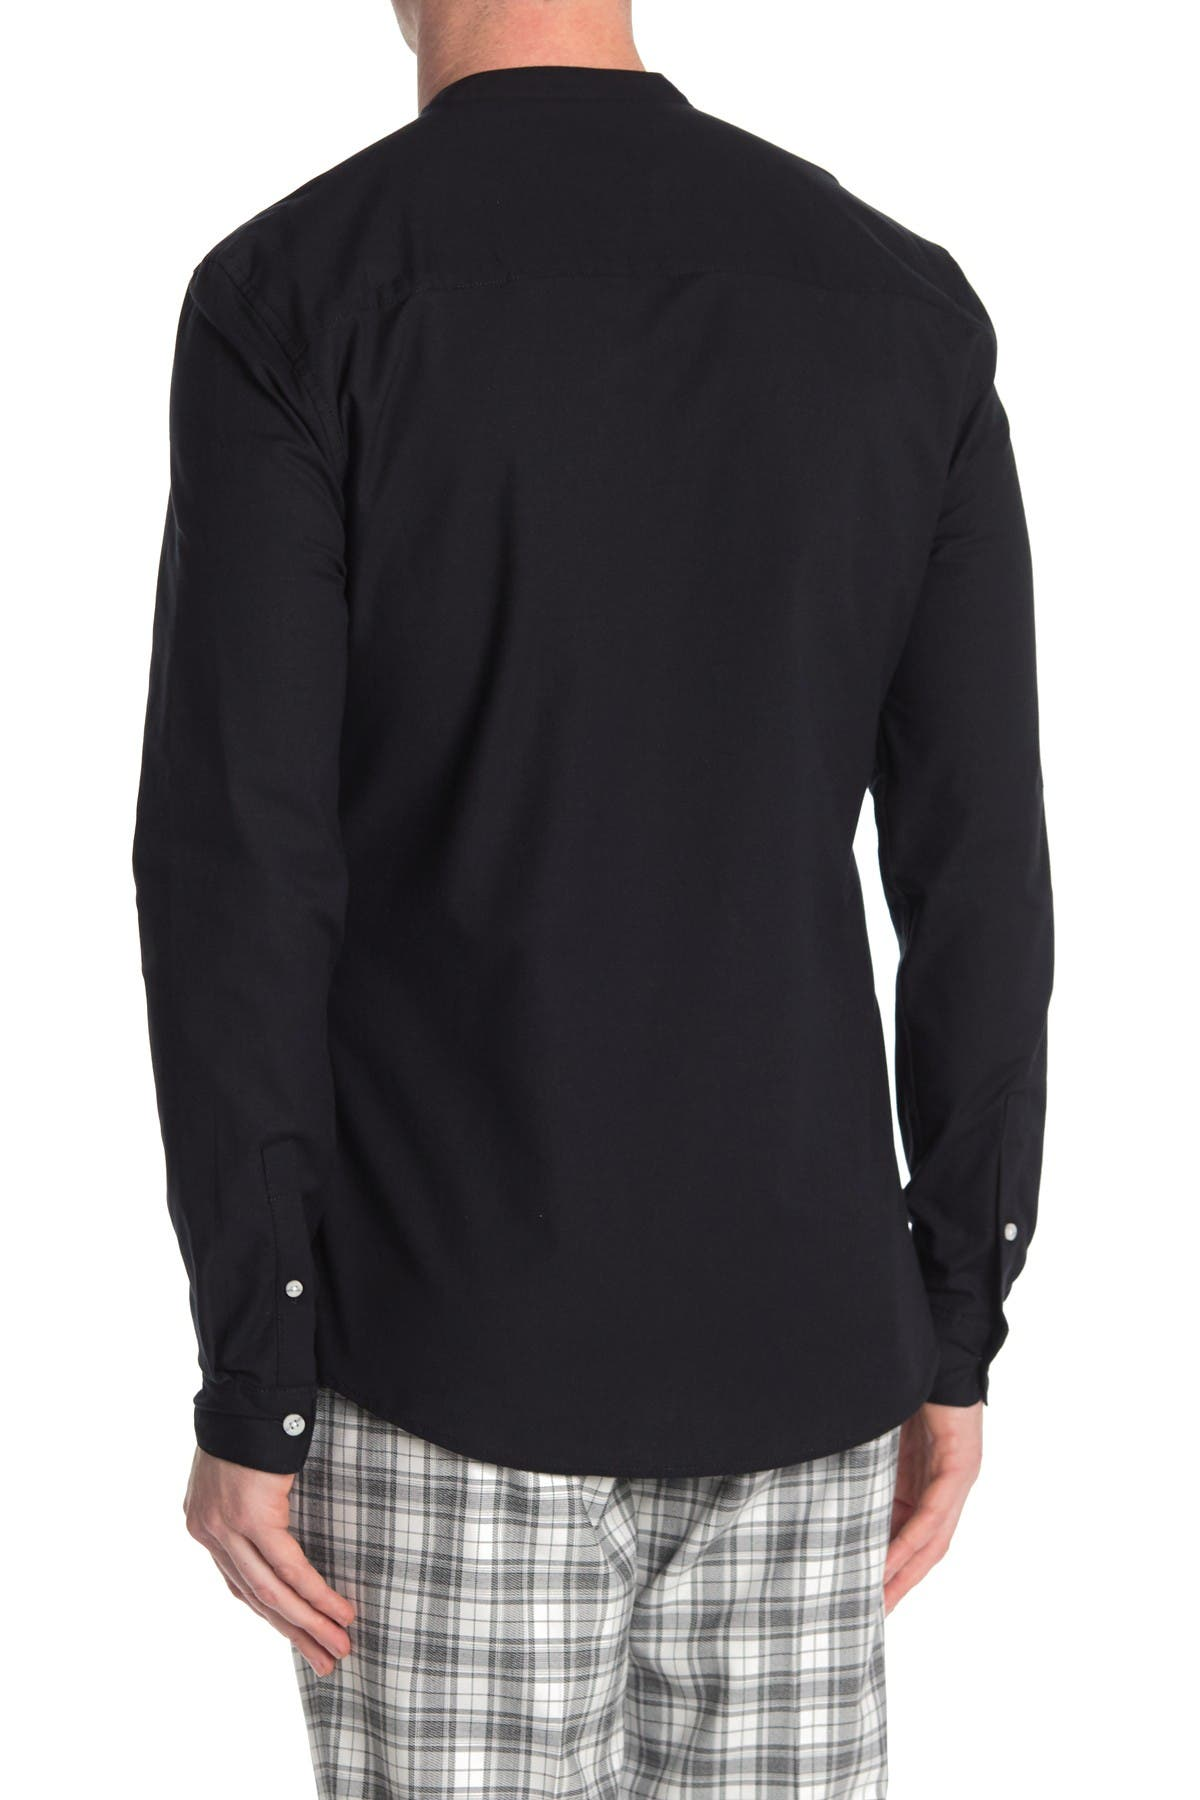 Image of TOPMAN Solid Mandarin Collar Shirt